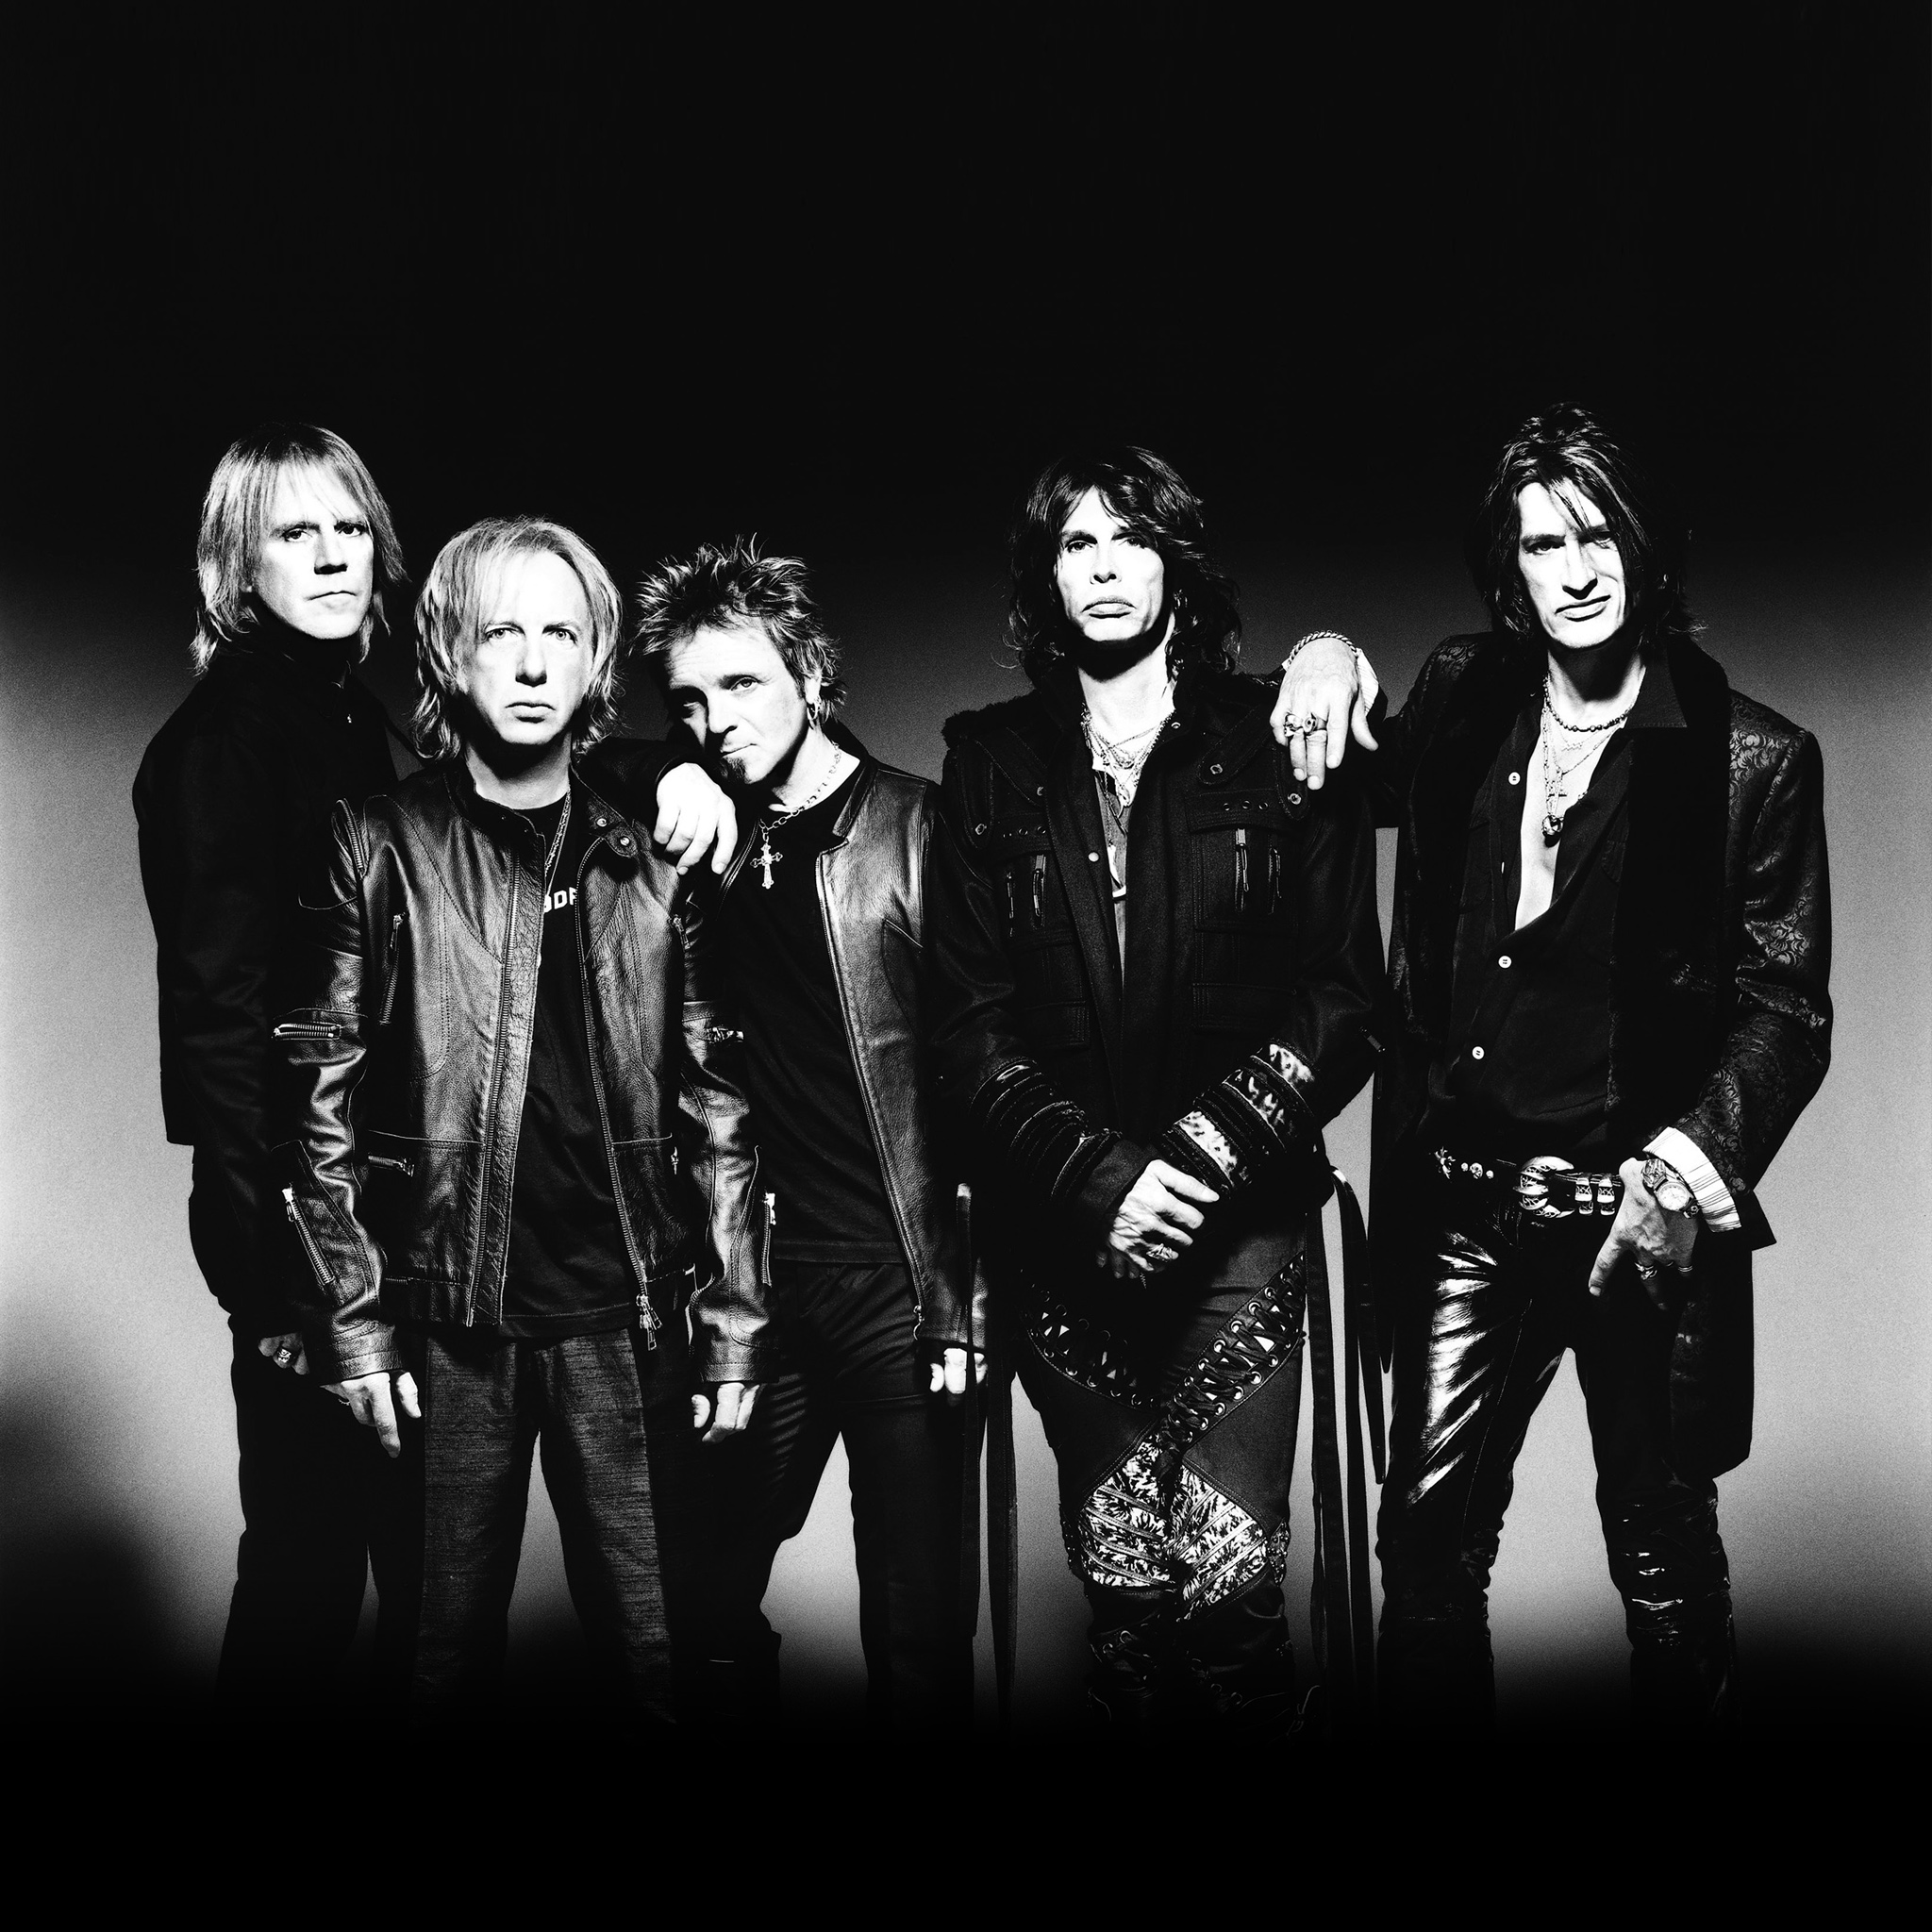 Aerosmith Announce First Studio Album in 11 Years